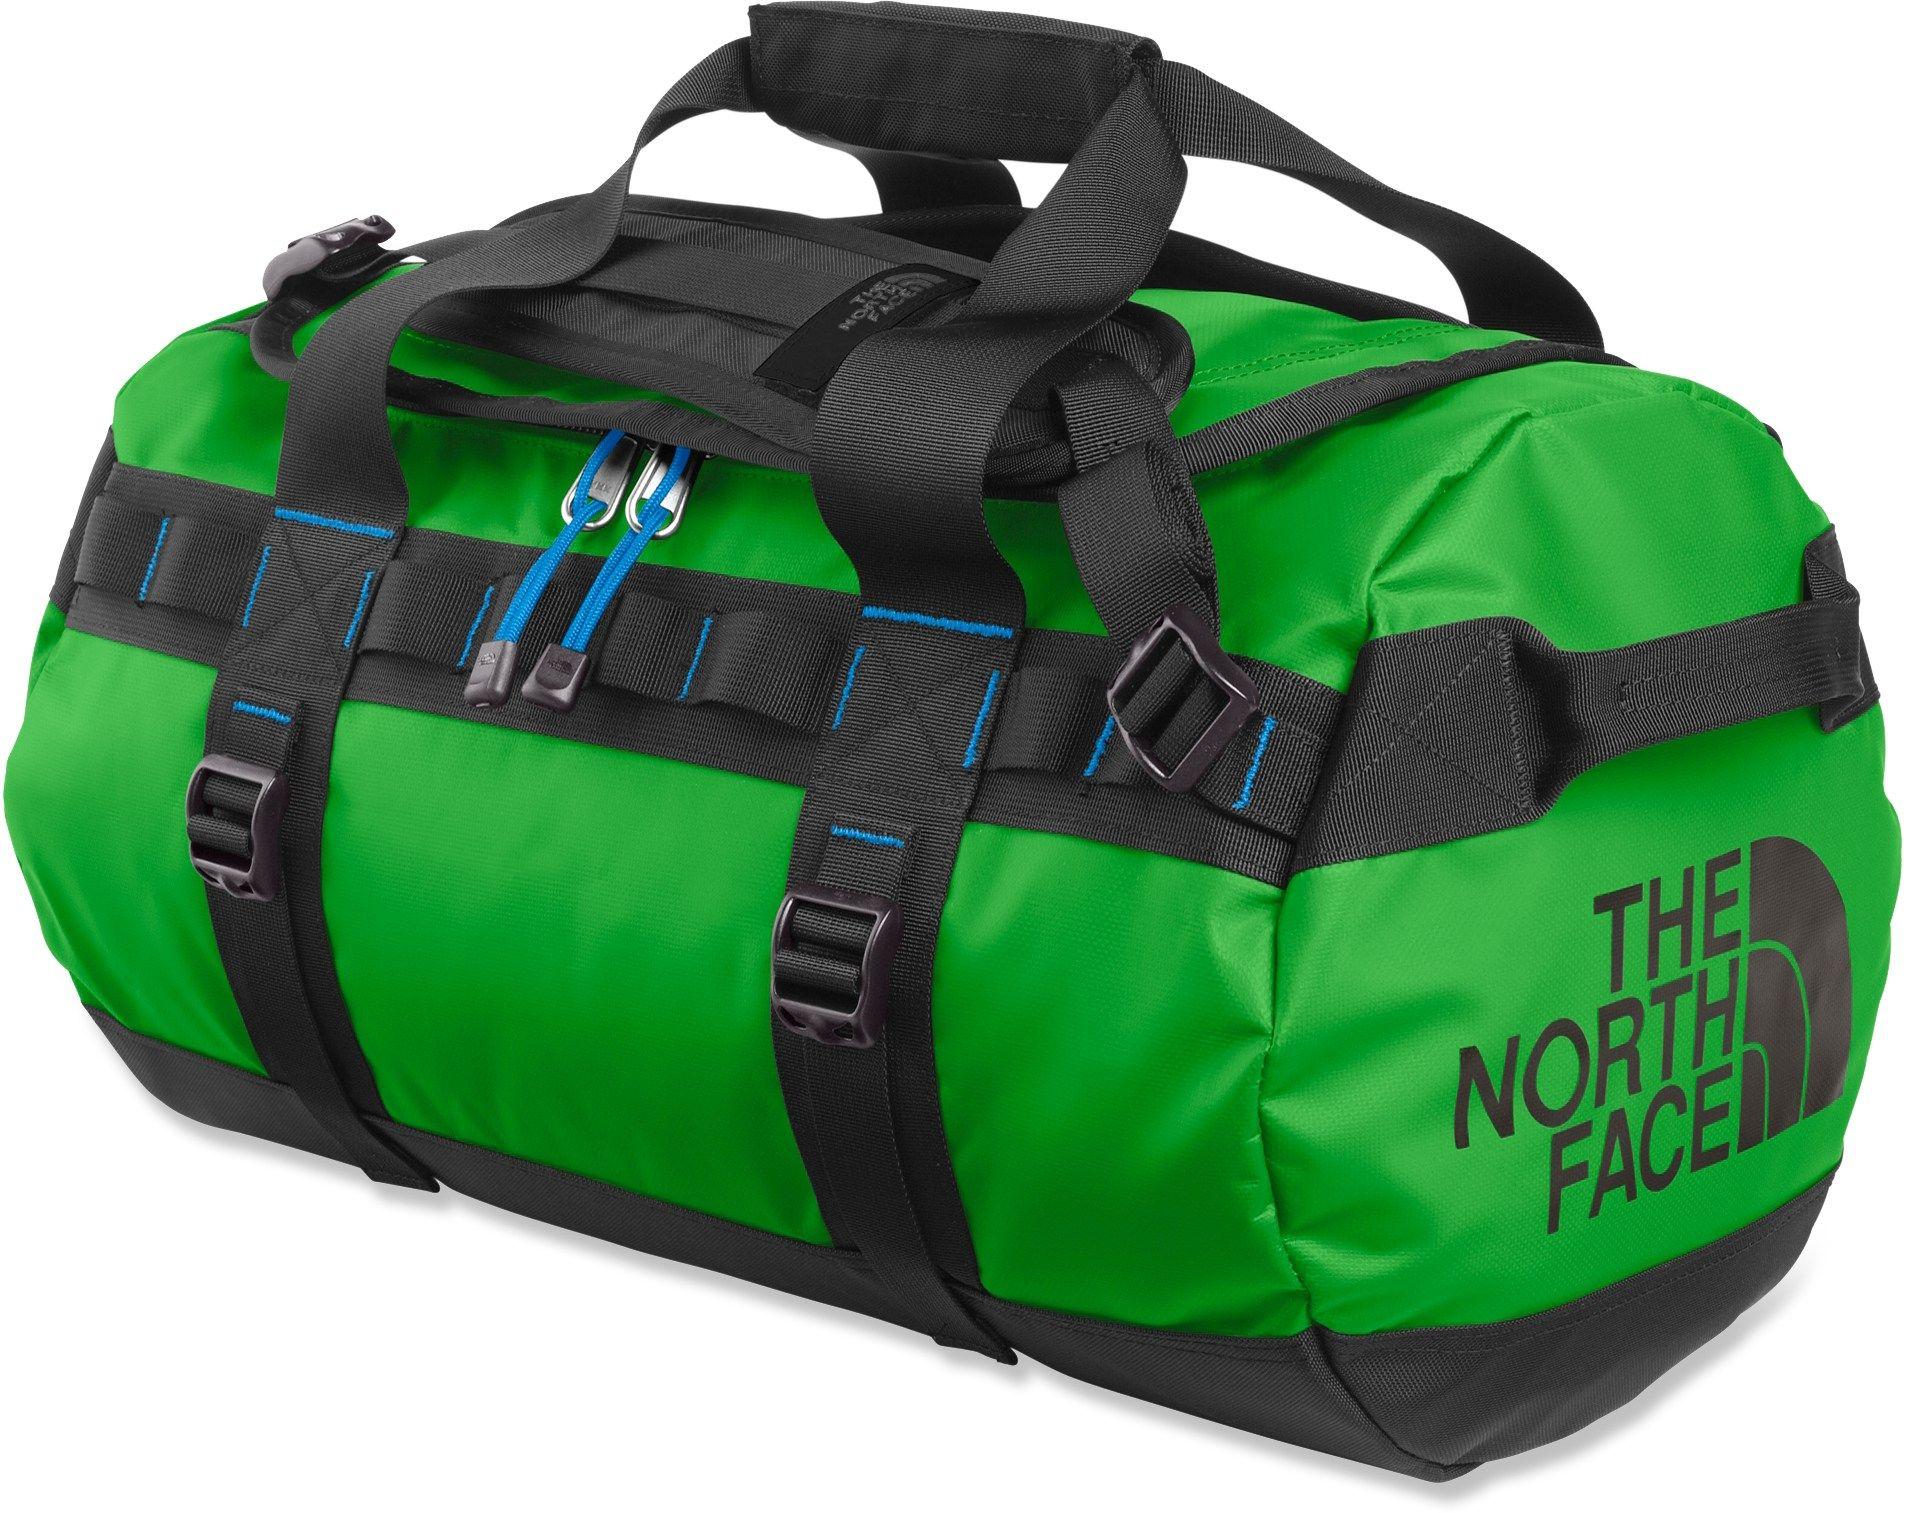 6acf92934 Base Camp Duffel - X-Small | I'd Do Terrible Things For | Duffel bag ...